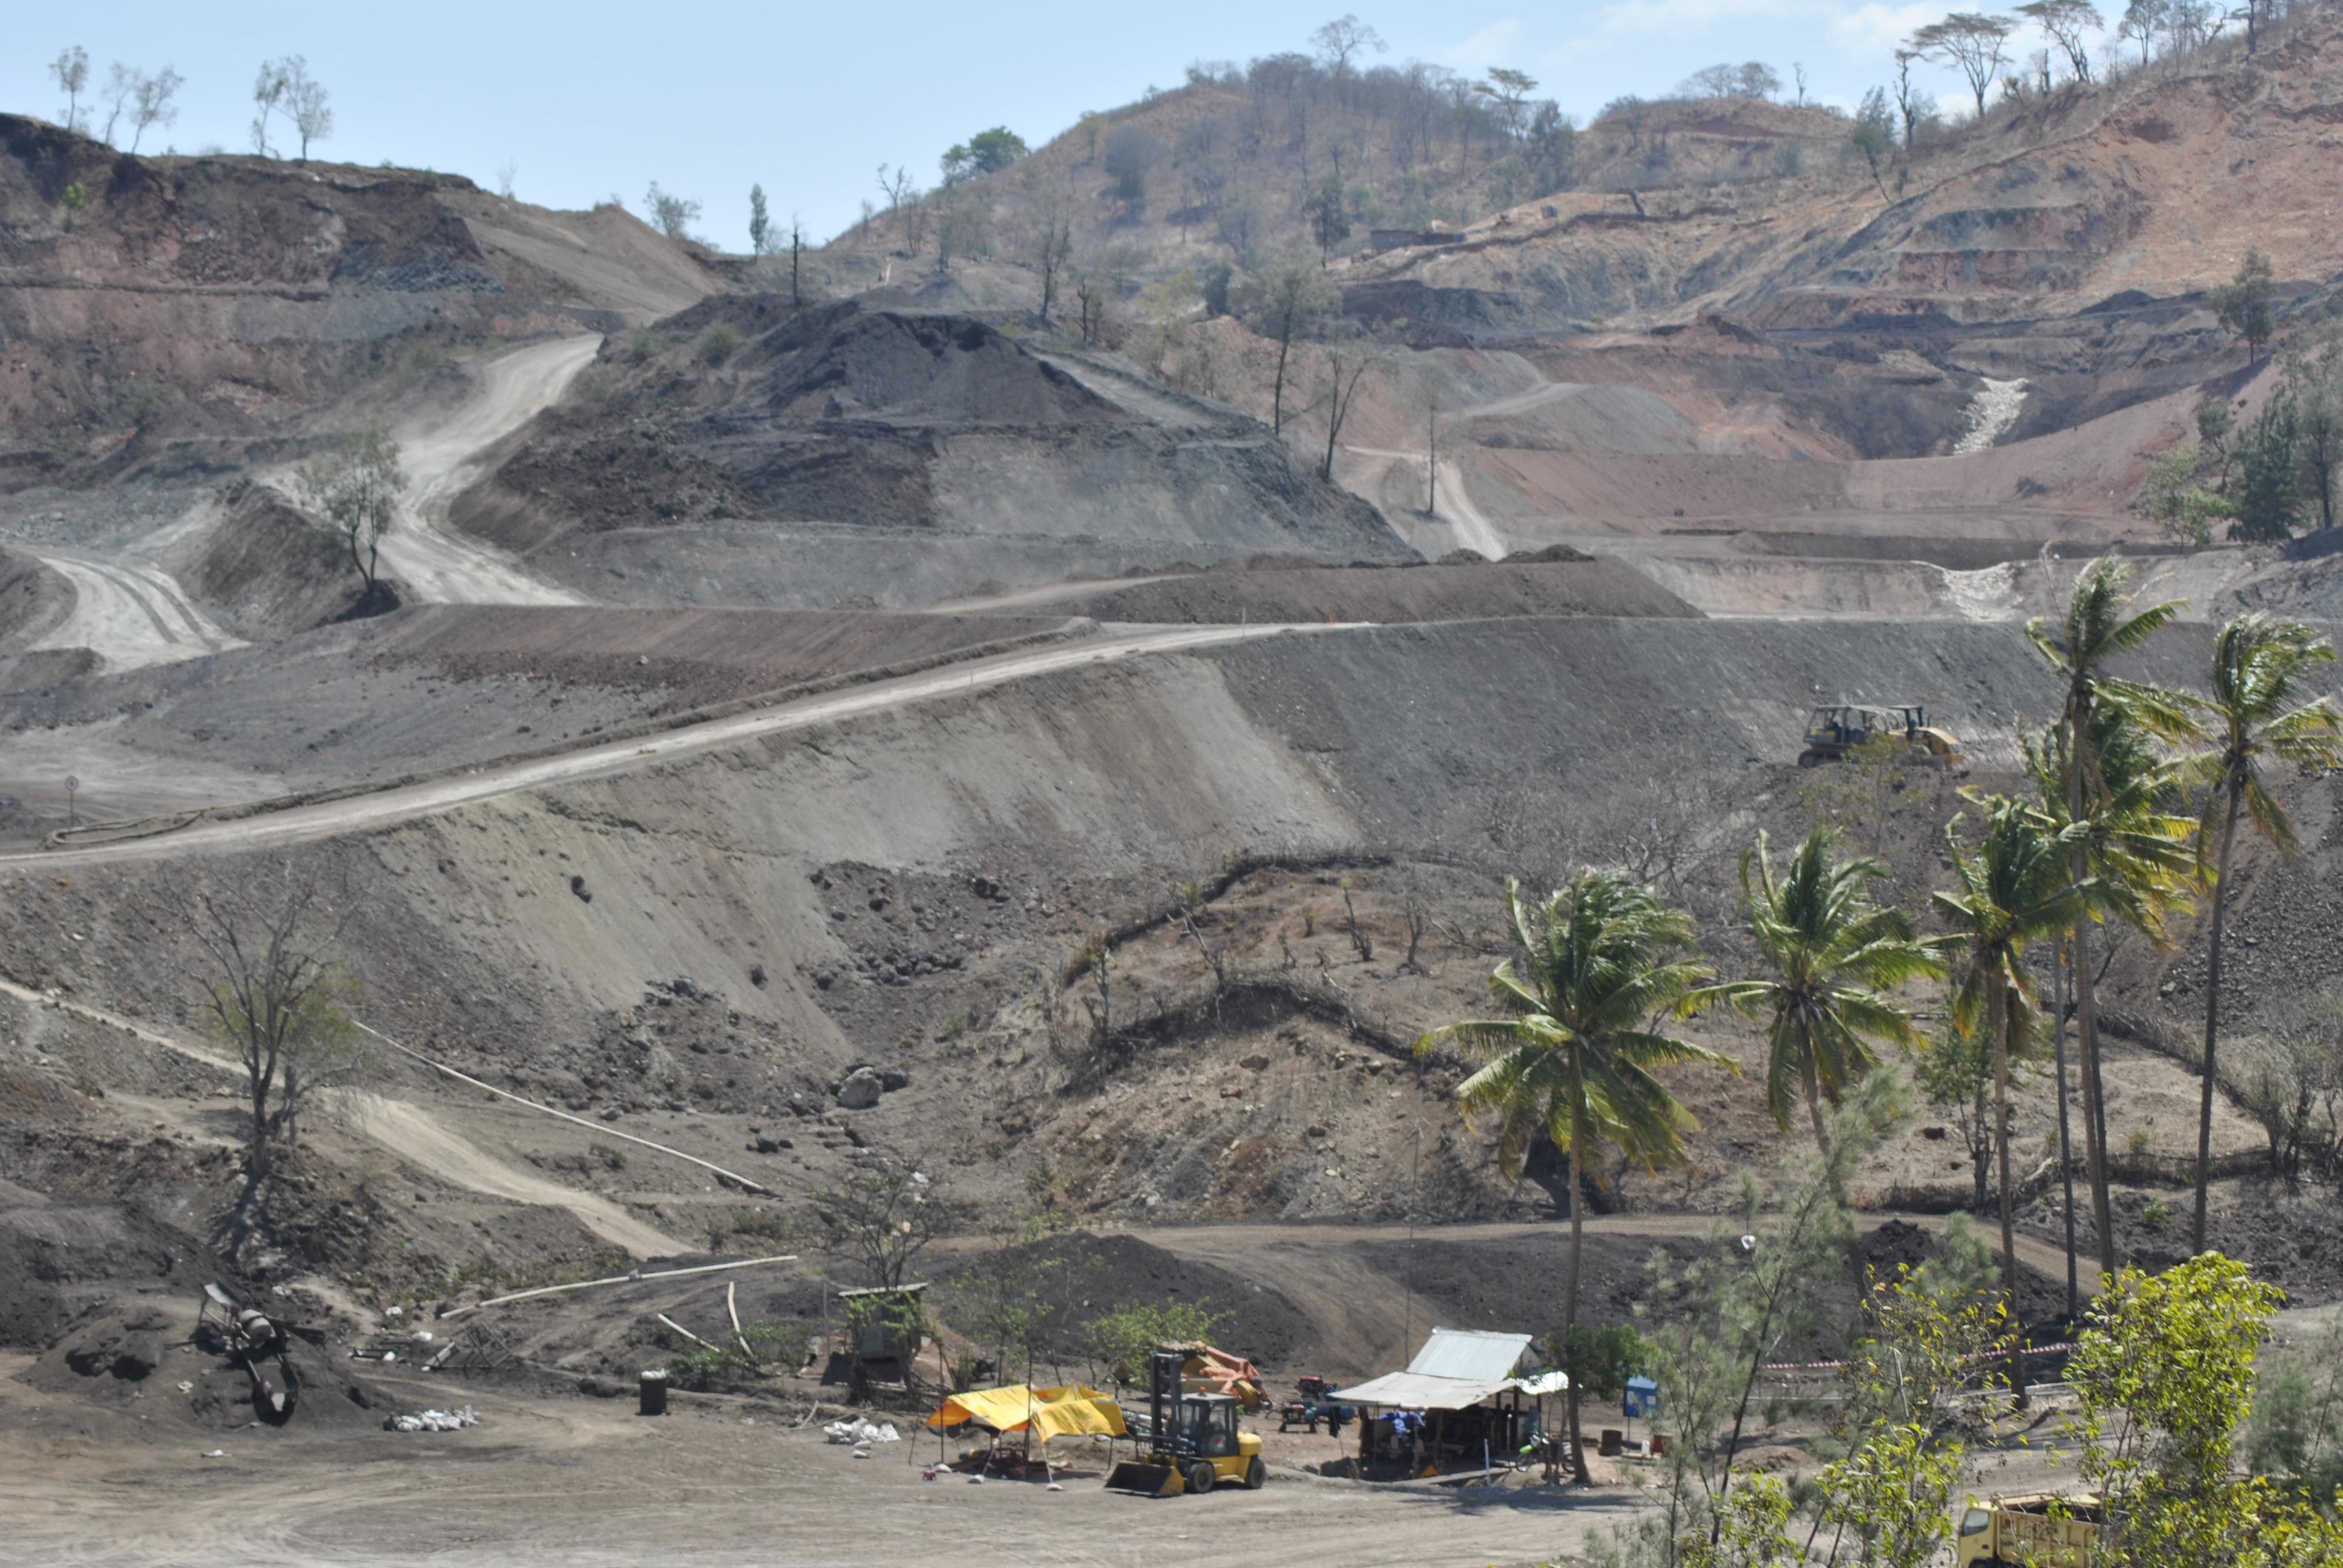 Pertambangan Mangan PT Soe Makmur Resources di Desa Supul, Kecamatan Kuatnana, Kabupaten Timor Tengah Selatan, NTT. Izin Tambang perusahaan ini diberikan Gubernur NTT, Frans Lebu Raya, dan berakhir pada 2032.